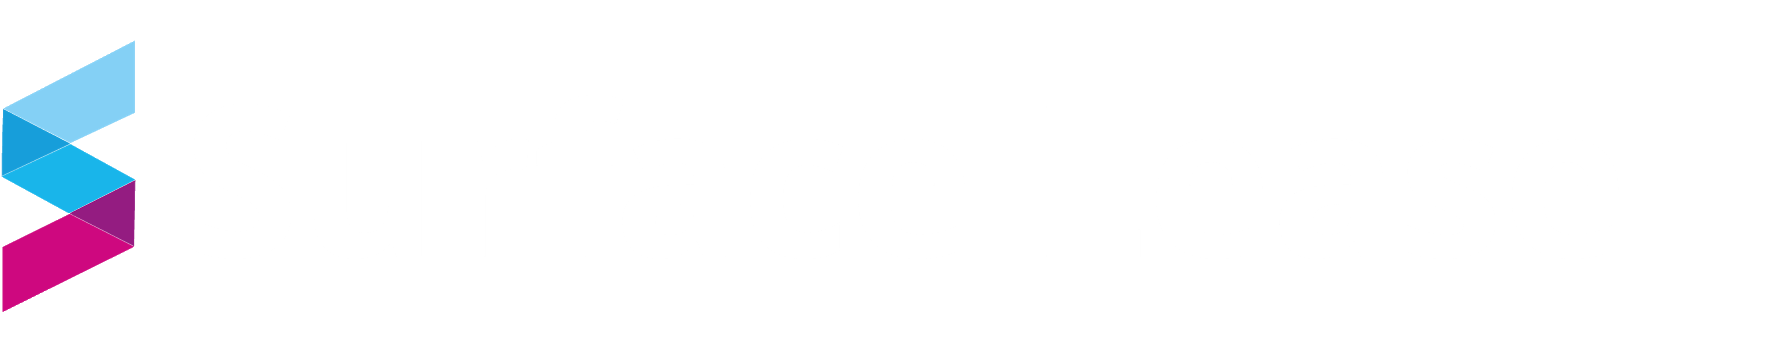 surfacelease logo